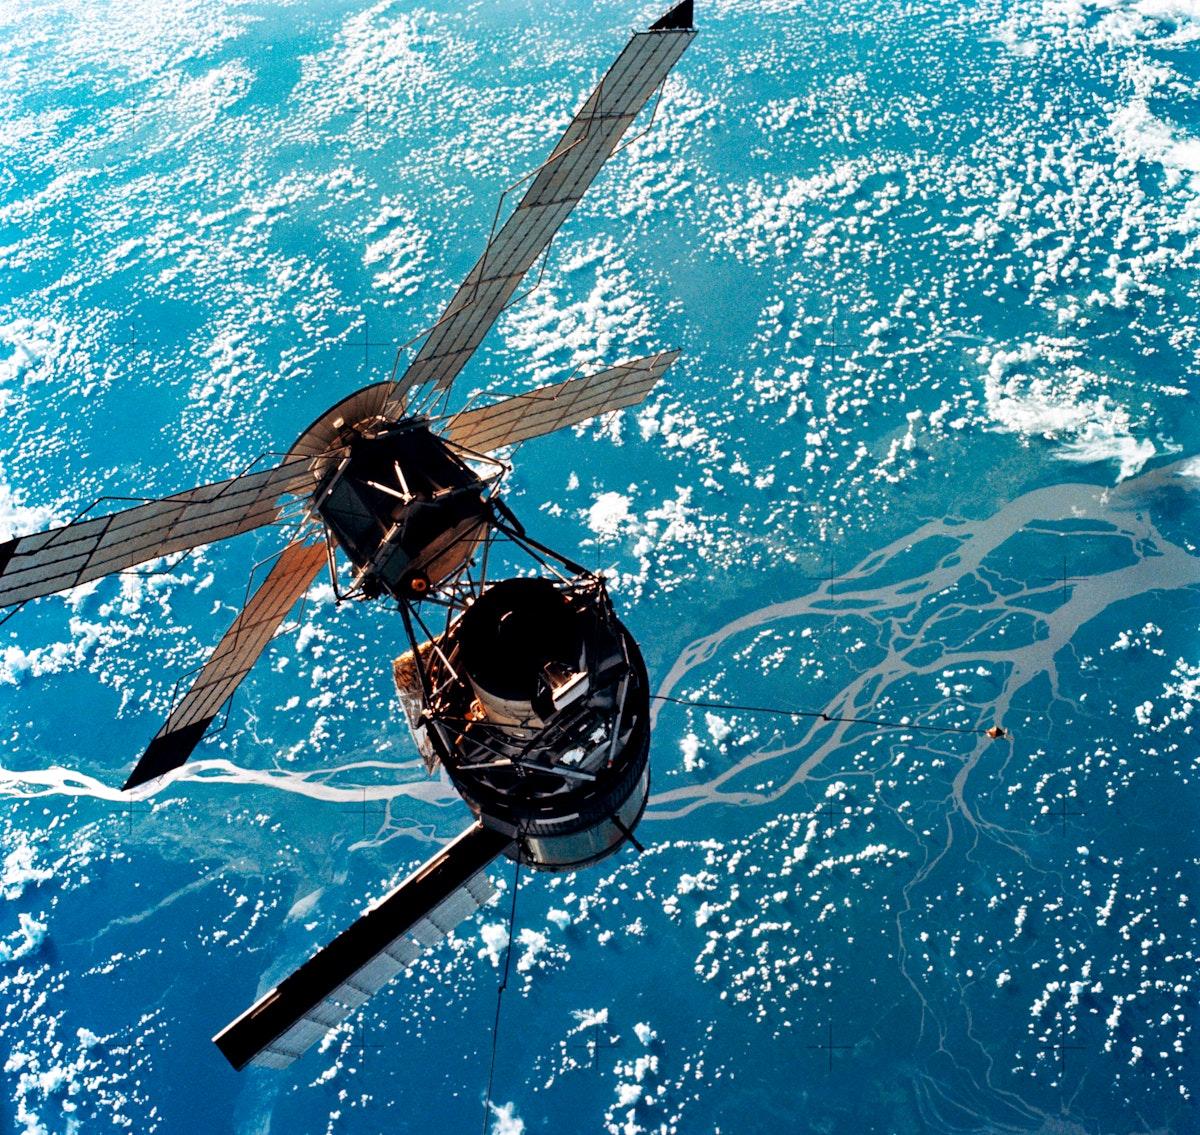 Skylab 3, Skylab as the CM moves in for docking Original from NASA. Digitally enhanced by rawpixel.